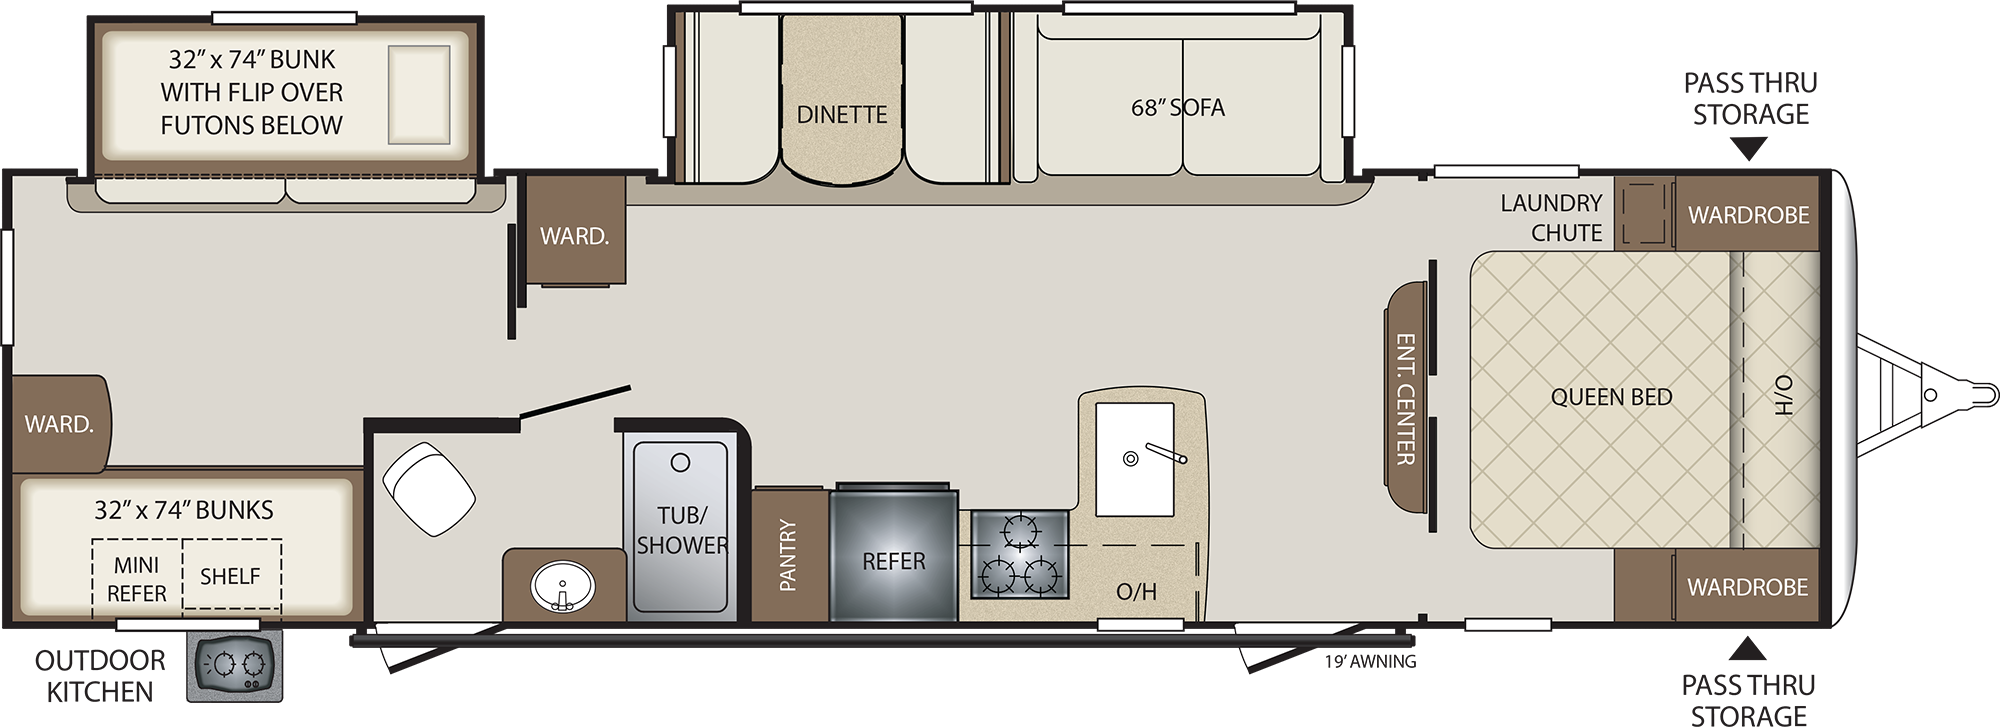 2019 KEYSTONE BULLET 308BHS (bunks) Floorplan